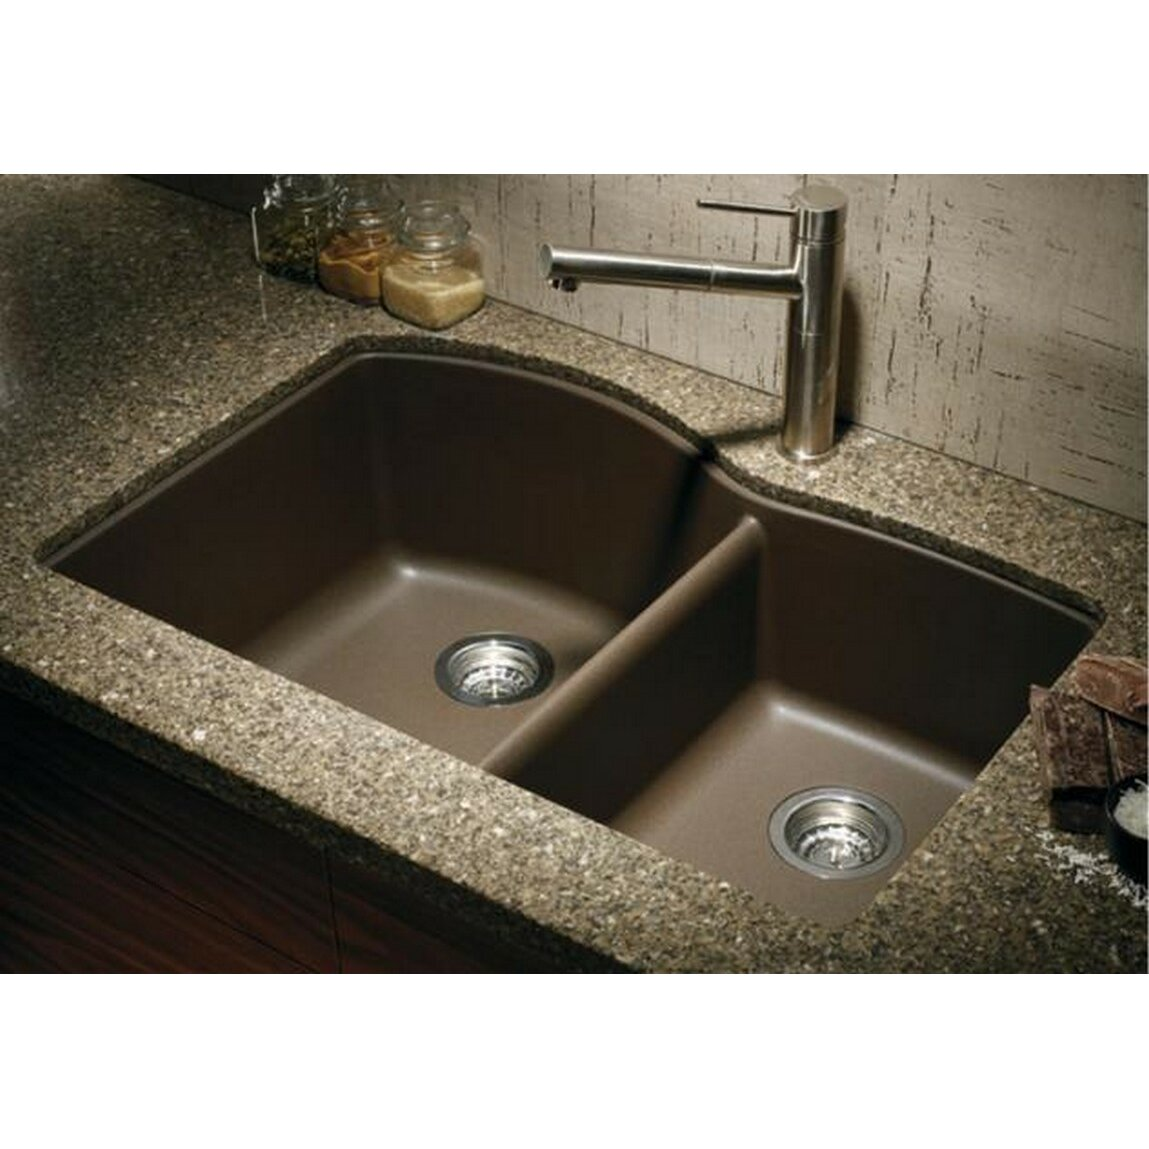 Blanco Granite Kitchen Sinks Blanco Diamond 32 X 19 Bowl Undermount Kitchen Sink Reviews